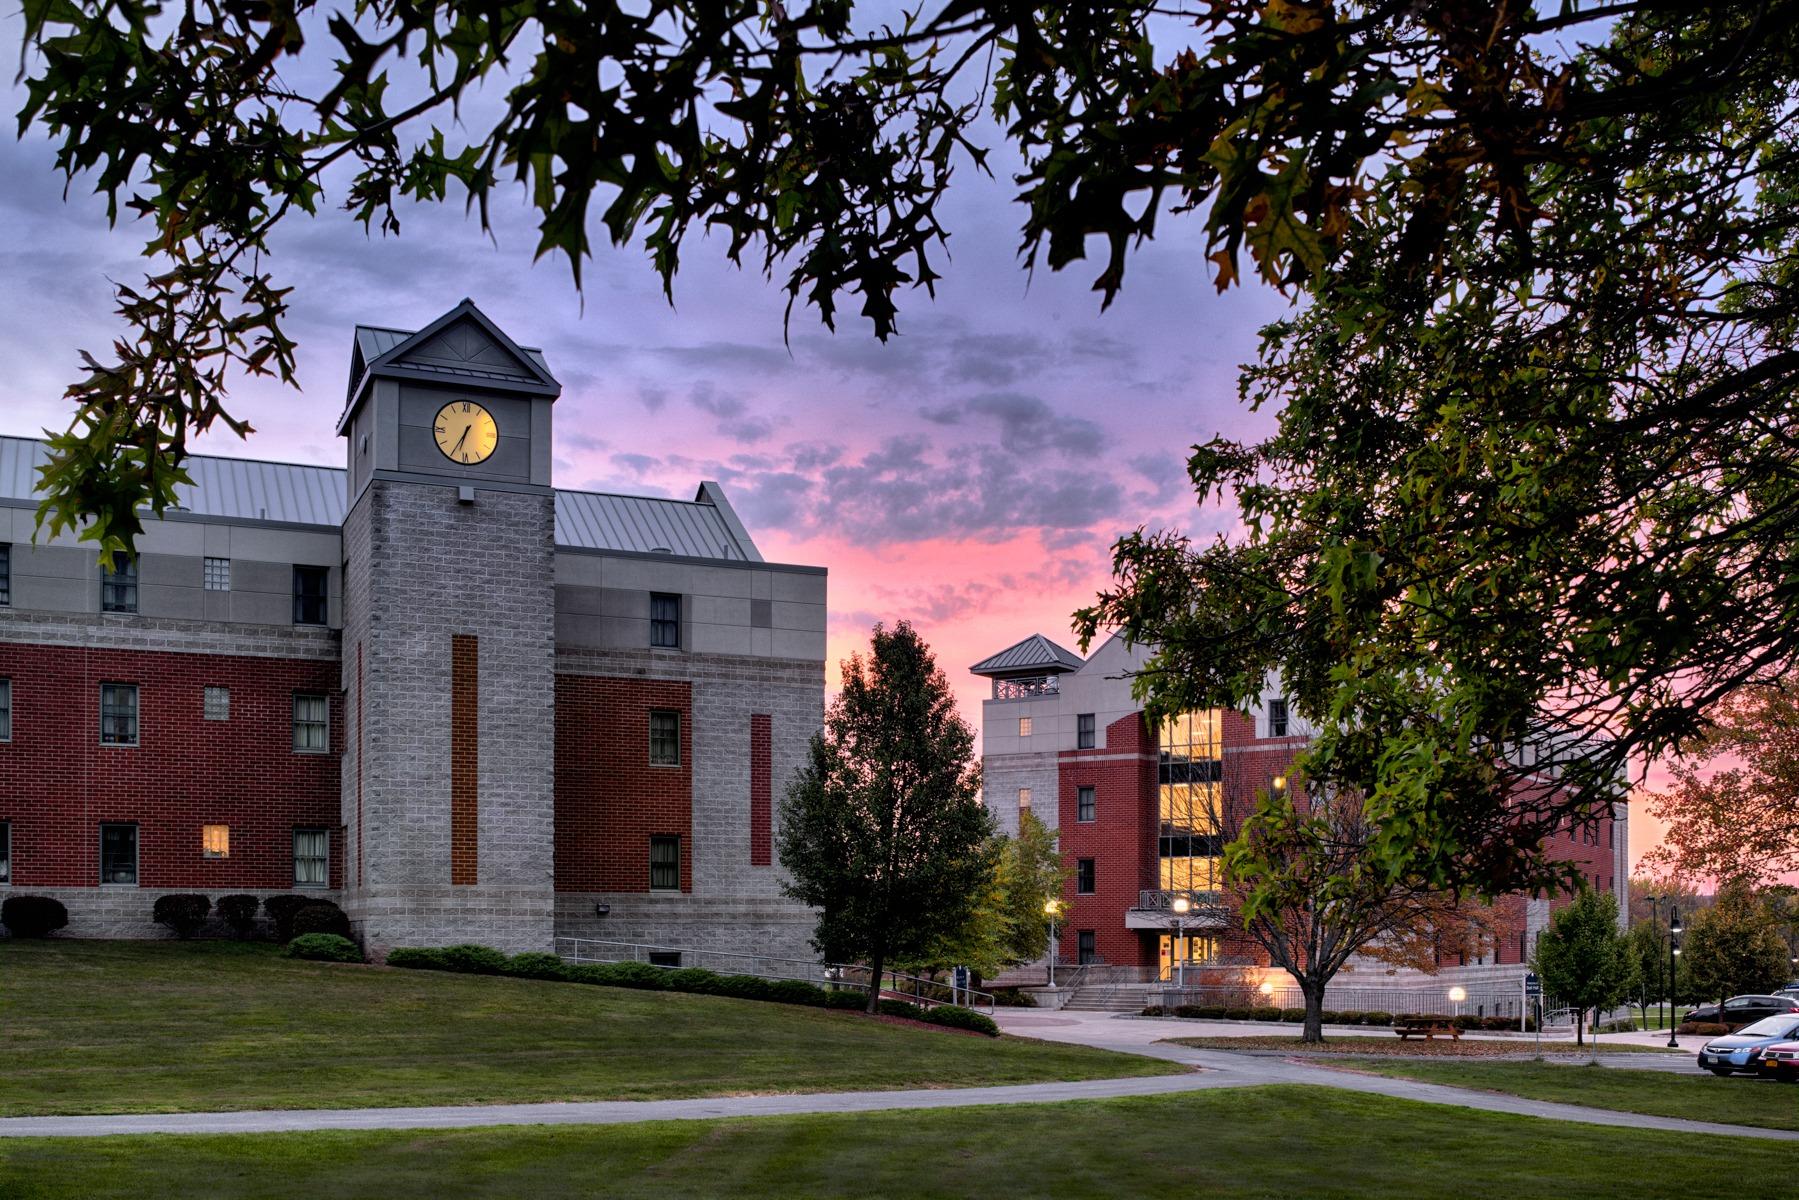 Photo by Utica College